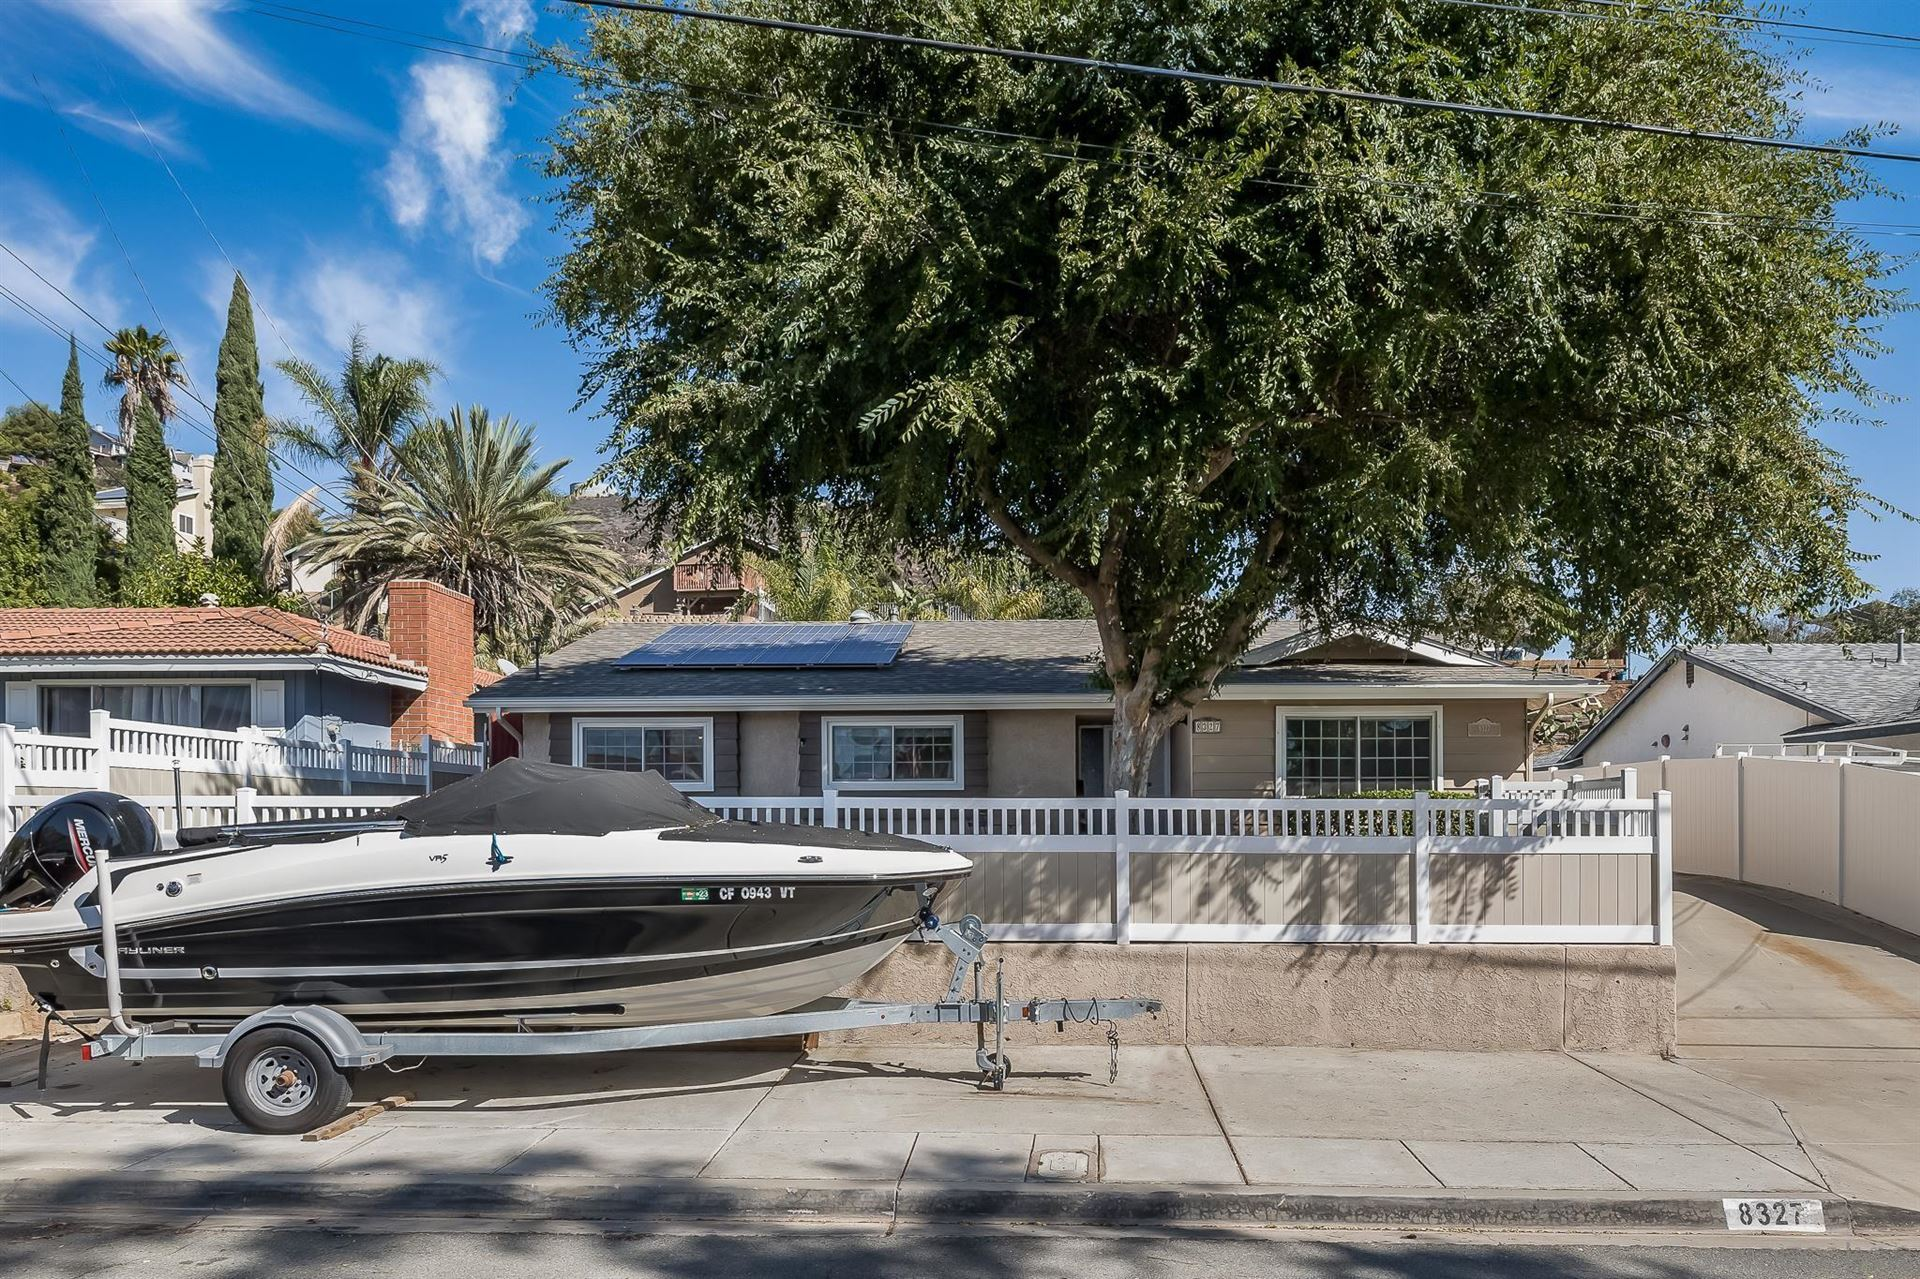 Photo of 8327 Sheila St, El Cajon, CA 92021 (MLS # 210029355)